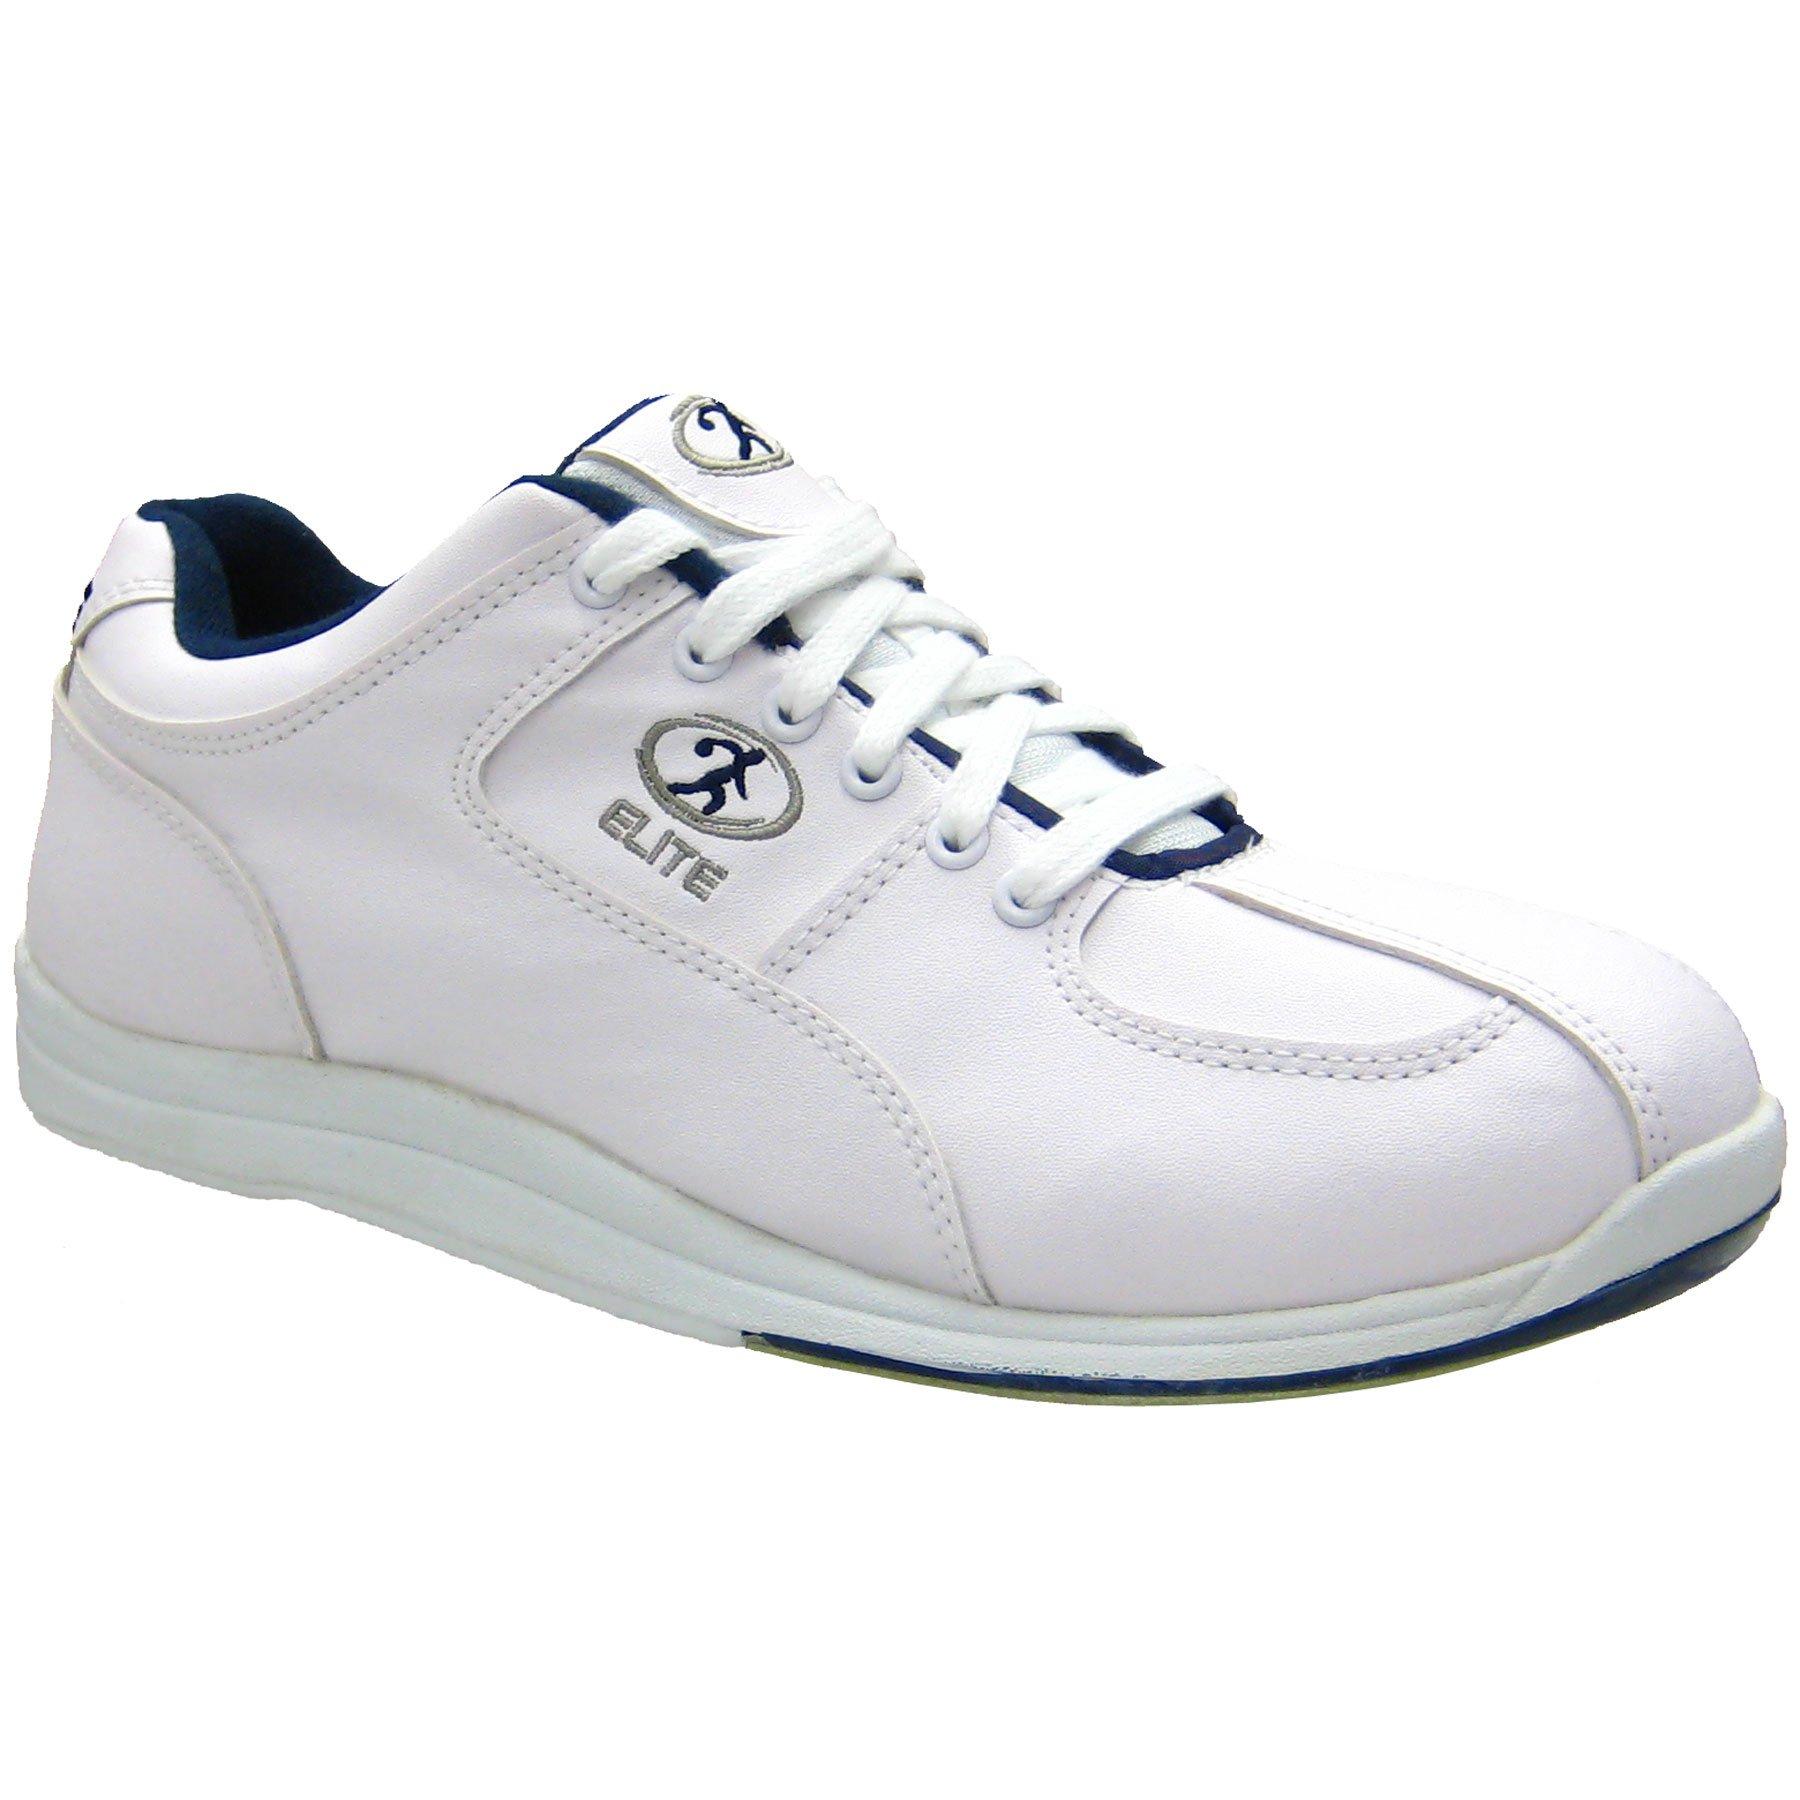 Elite Atlas White/Blue Bowling Shoes - Mens 10